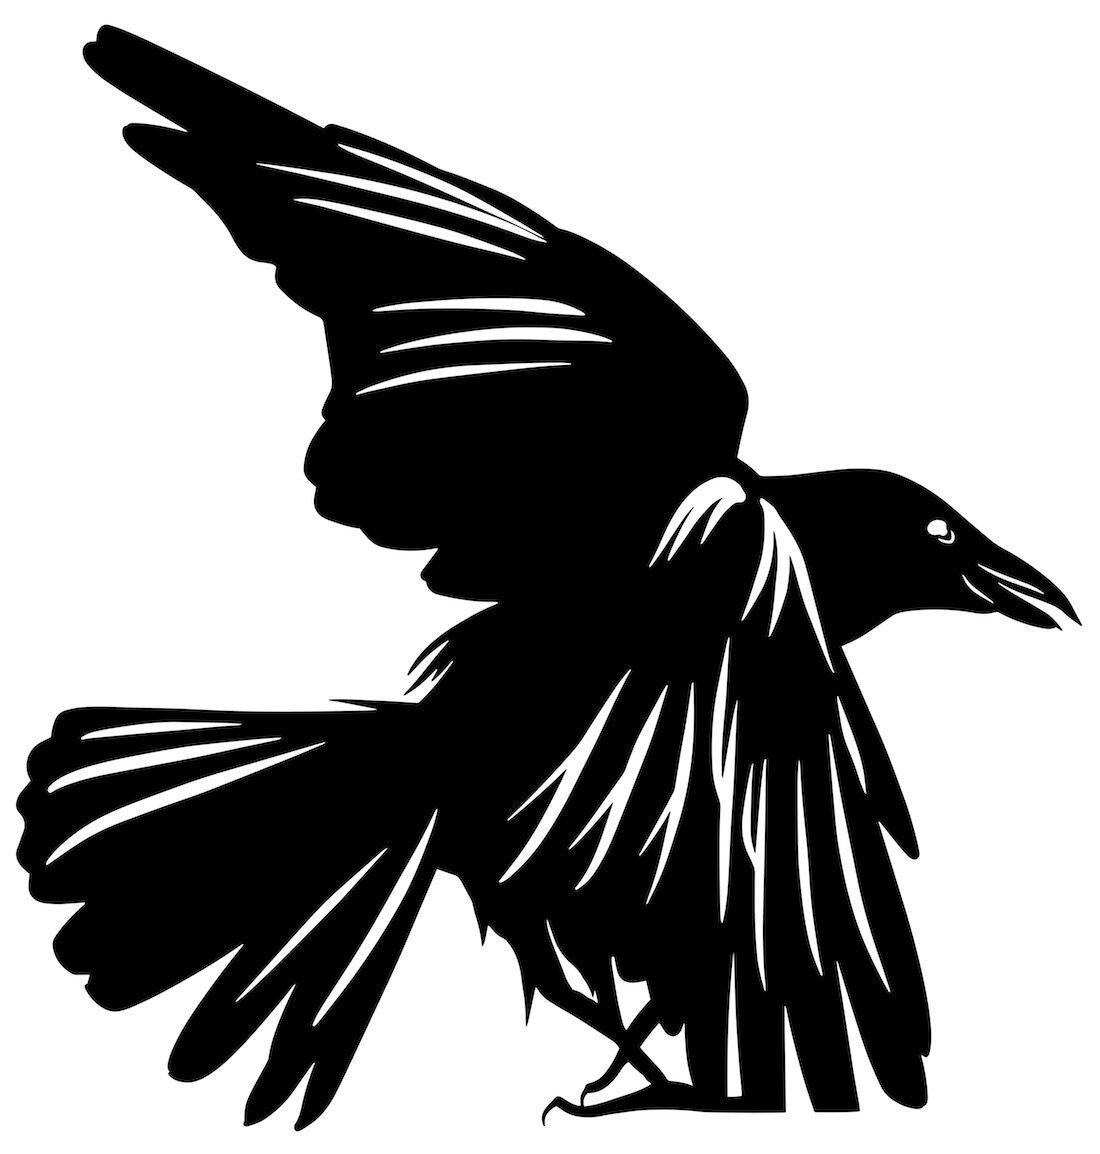 Alejandro Fernandez-crows_6.jpg